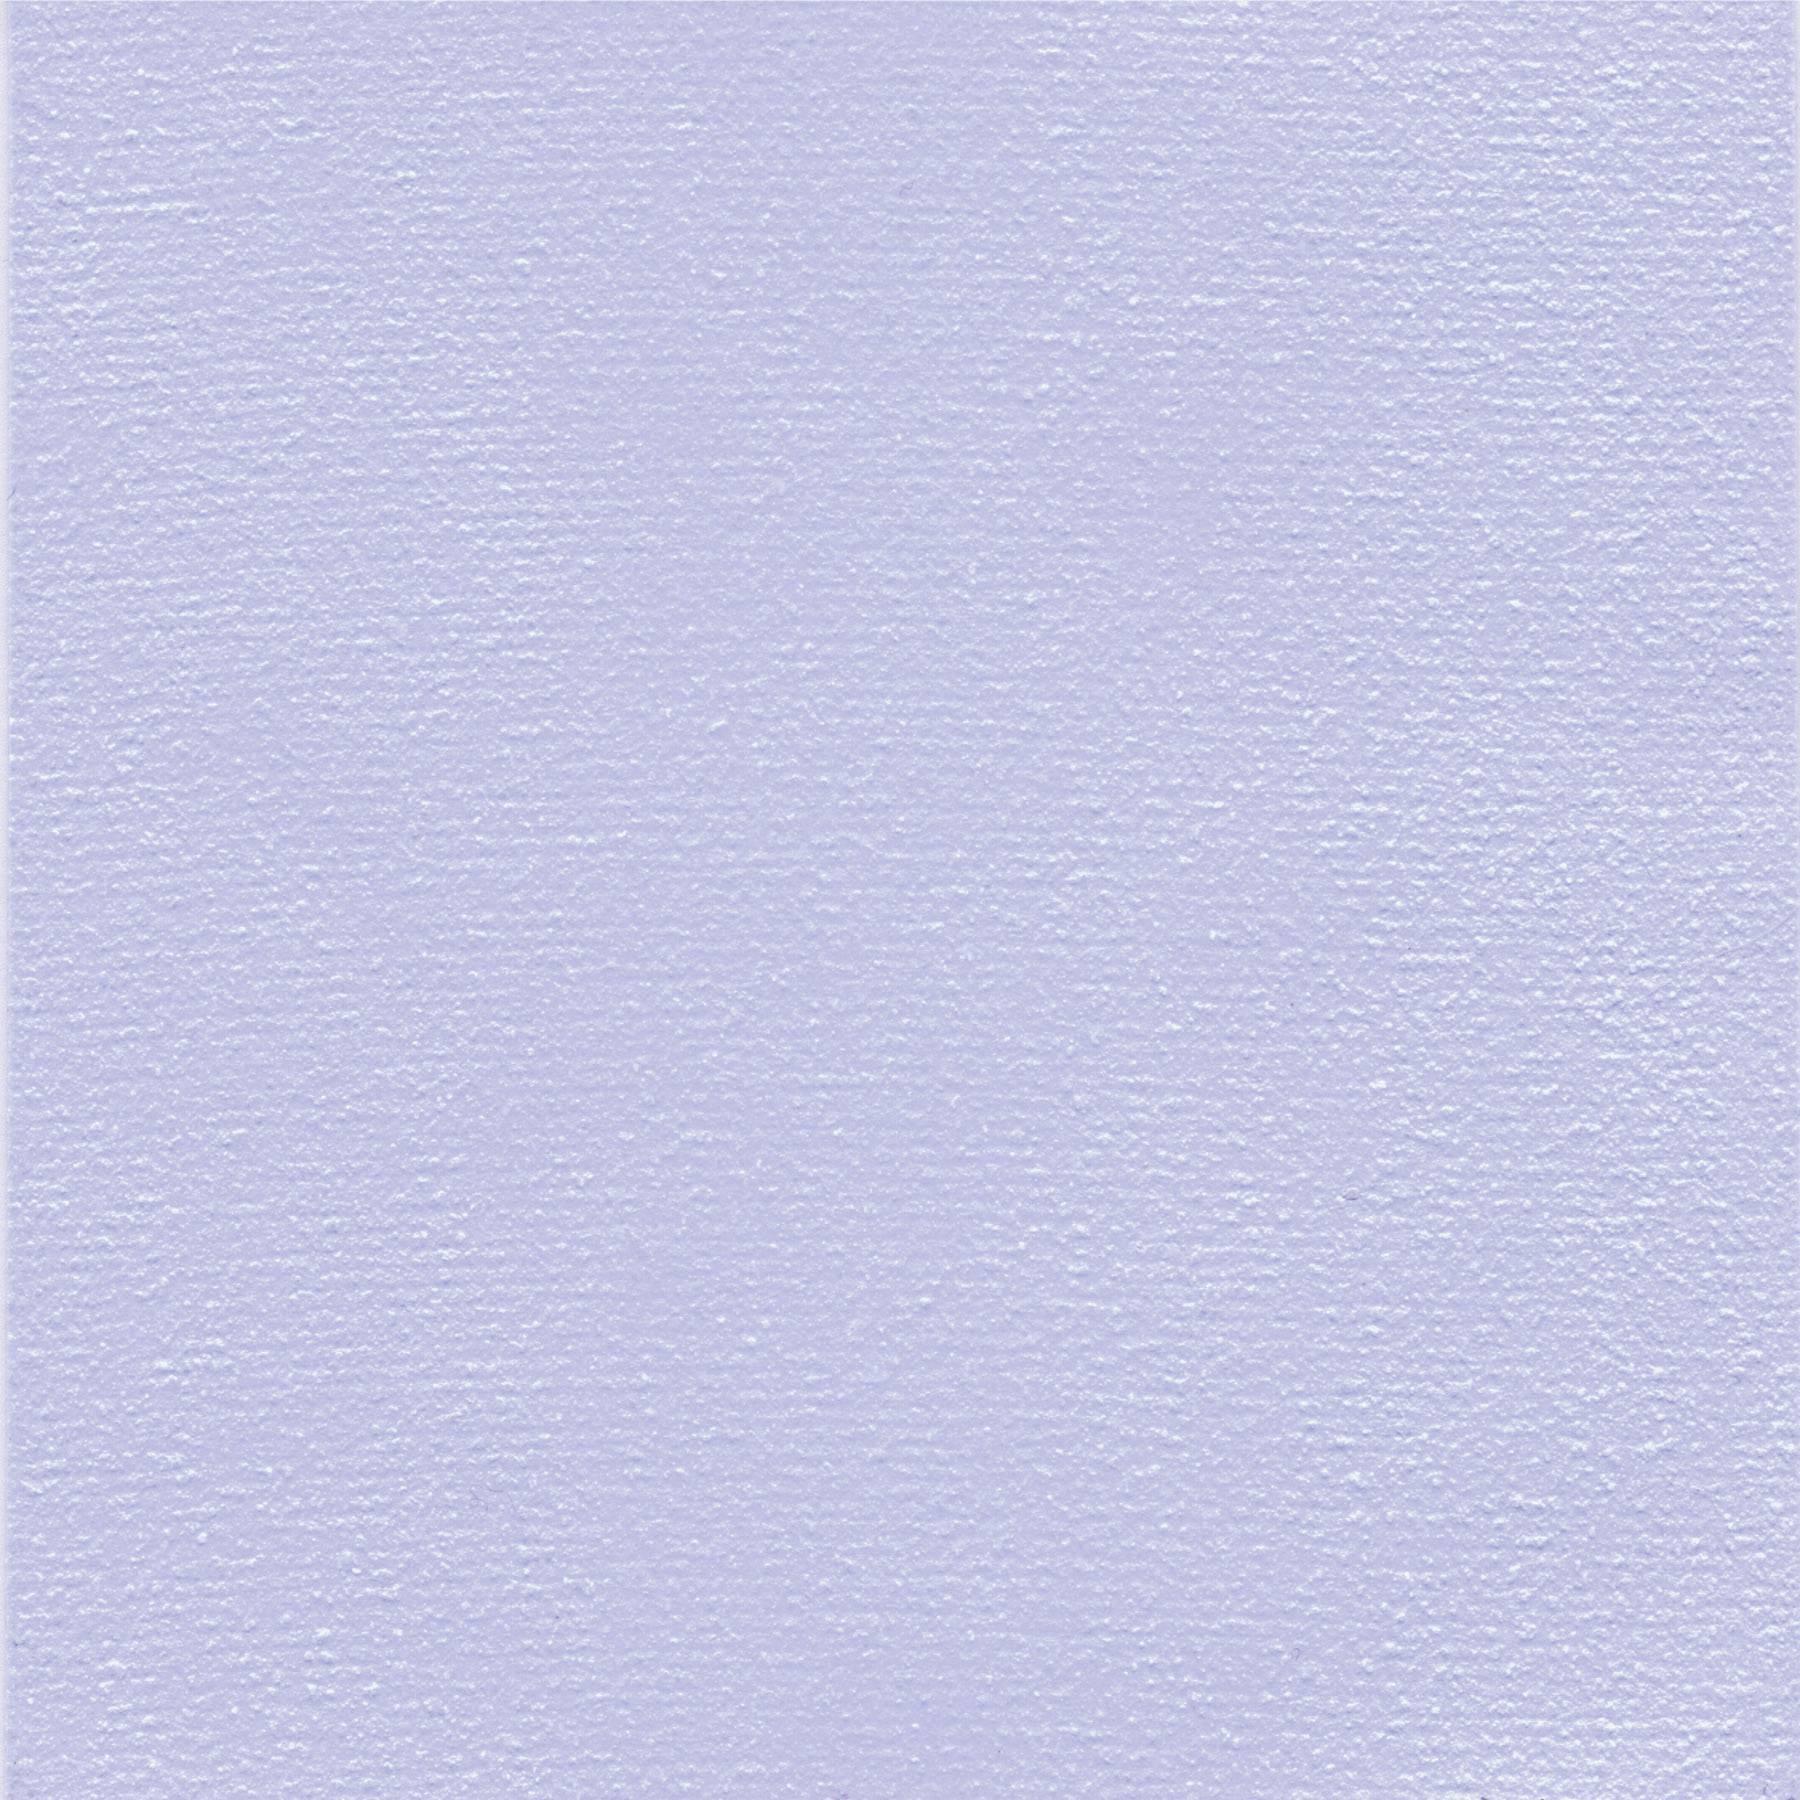 Teplovodivá fólia Kerafol SOFTTHERM 86/300, 5 mm, 3 W/mK, (d x š) 100 mm x 100 mm